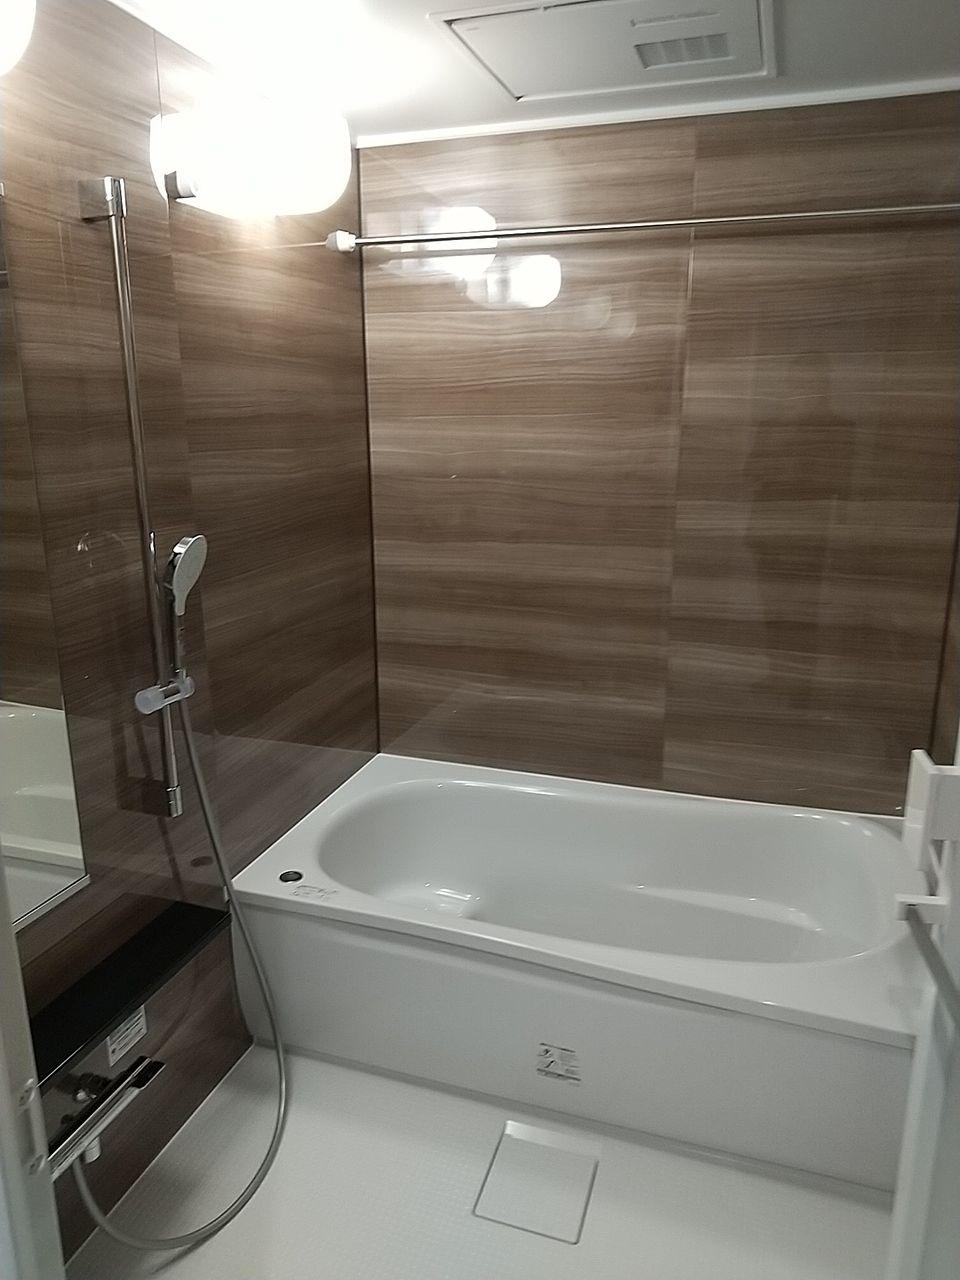 TOTO1428 浴室乾燥機付き